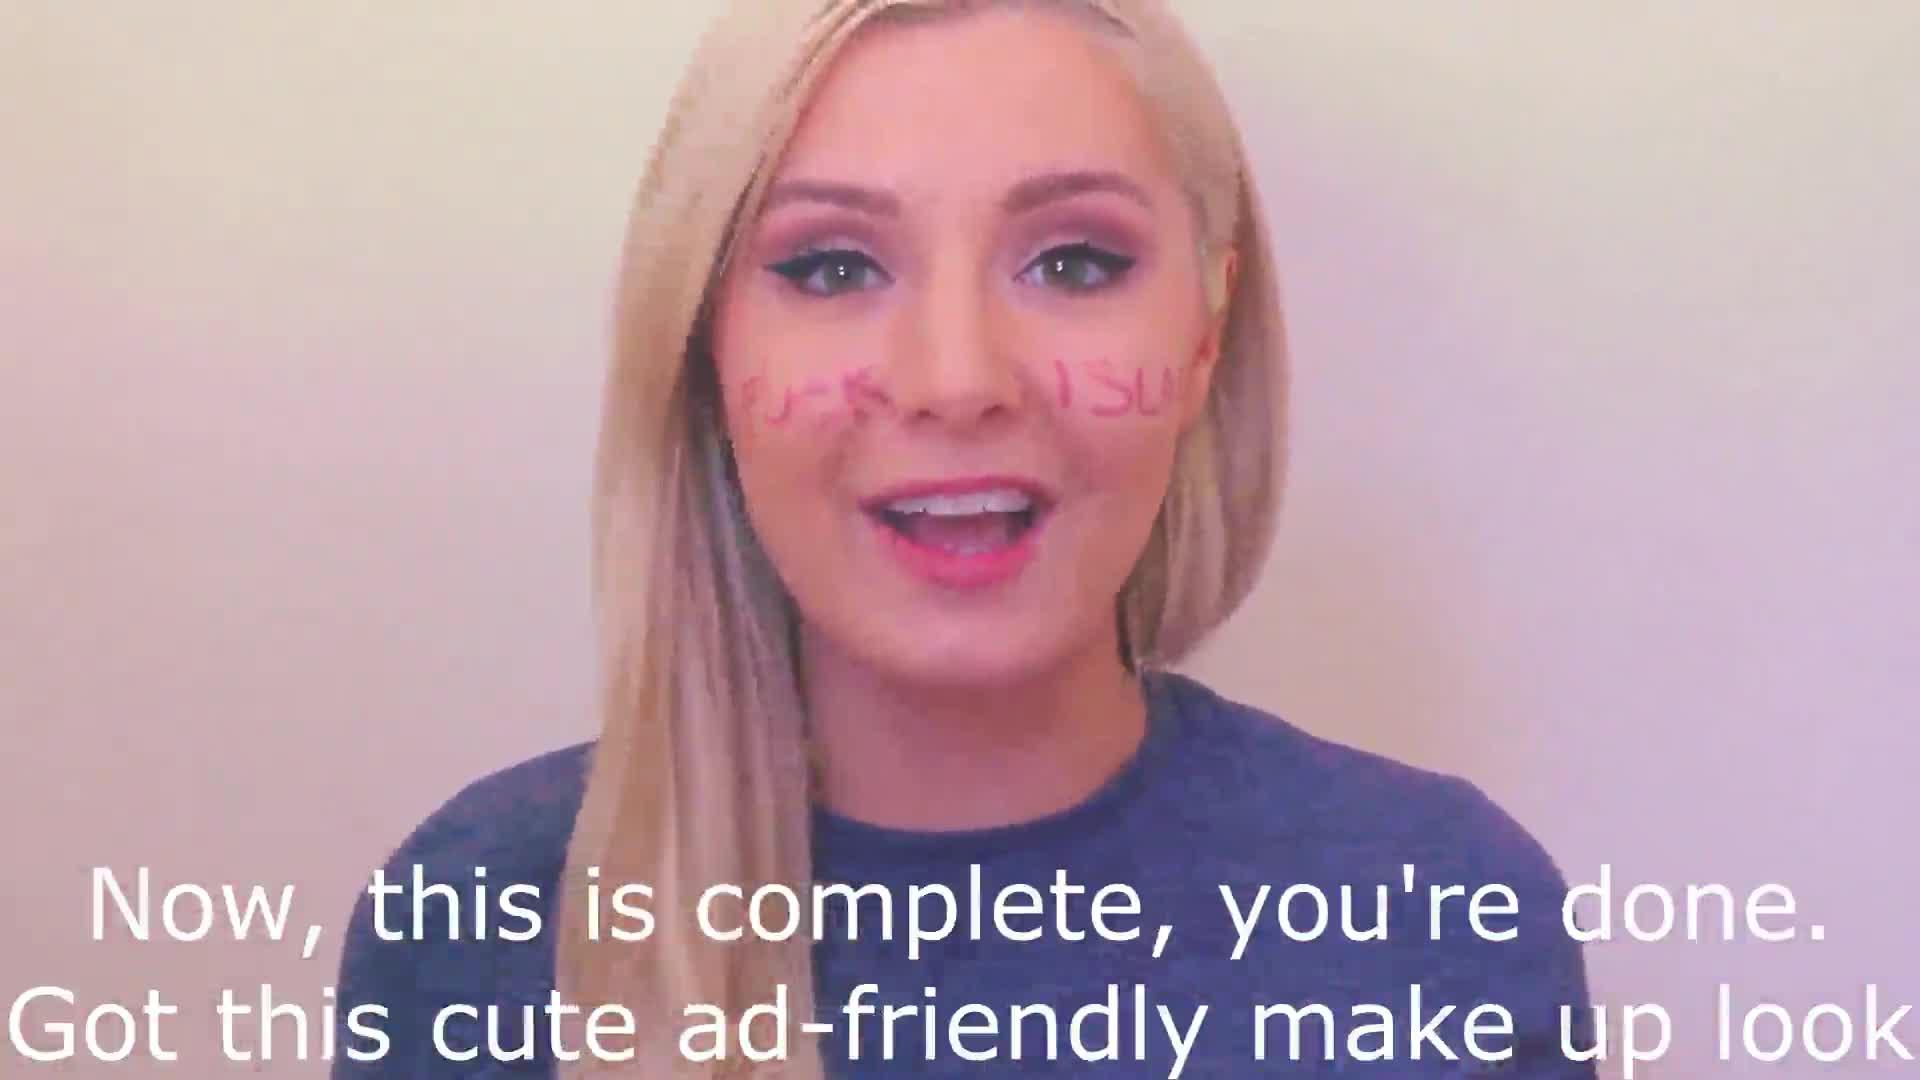 Makeup tips. .. Best Makeup, all girls should wear it.